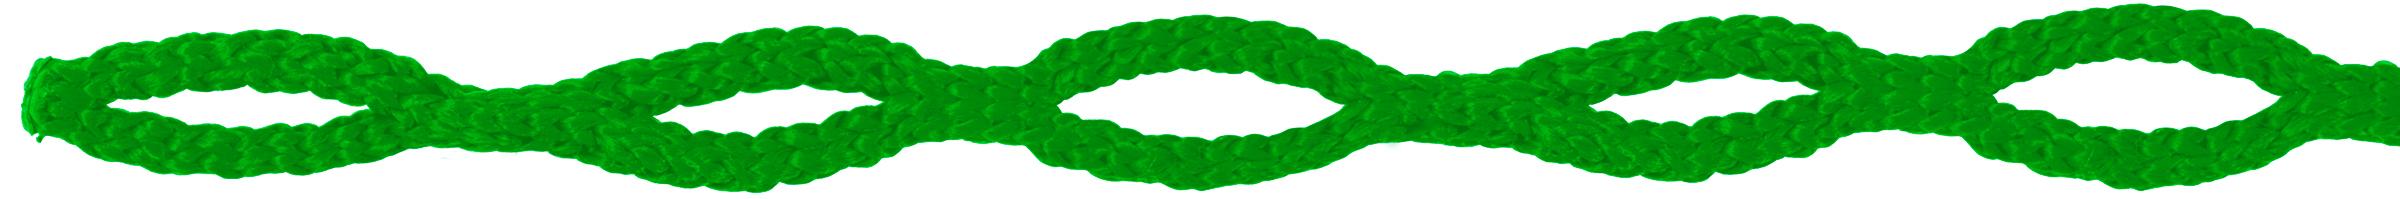 Isilink-Leine Ø 3,0 mm grün